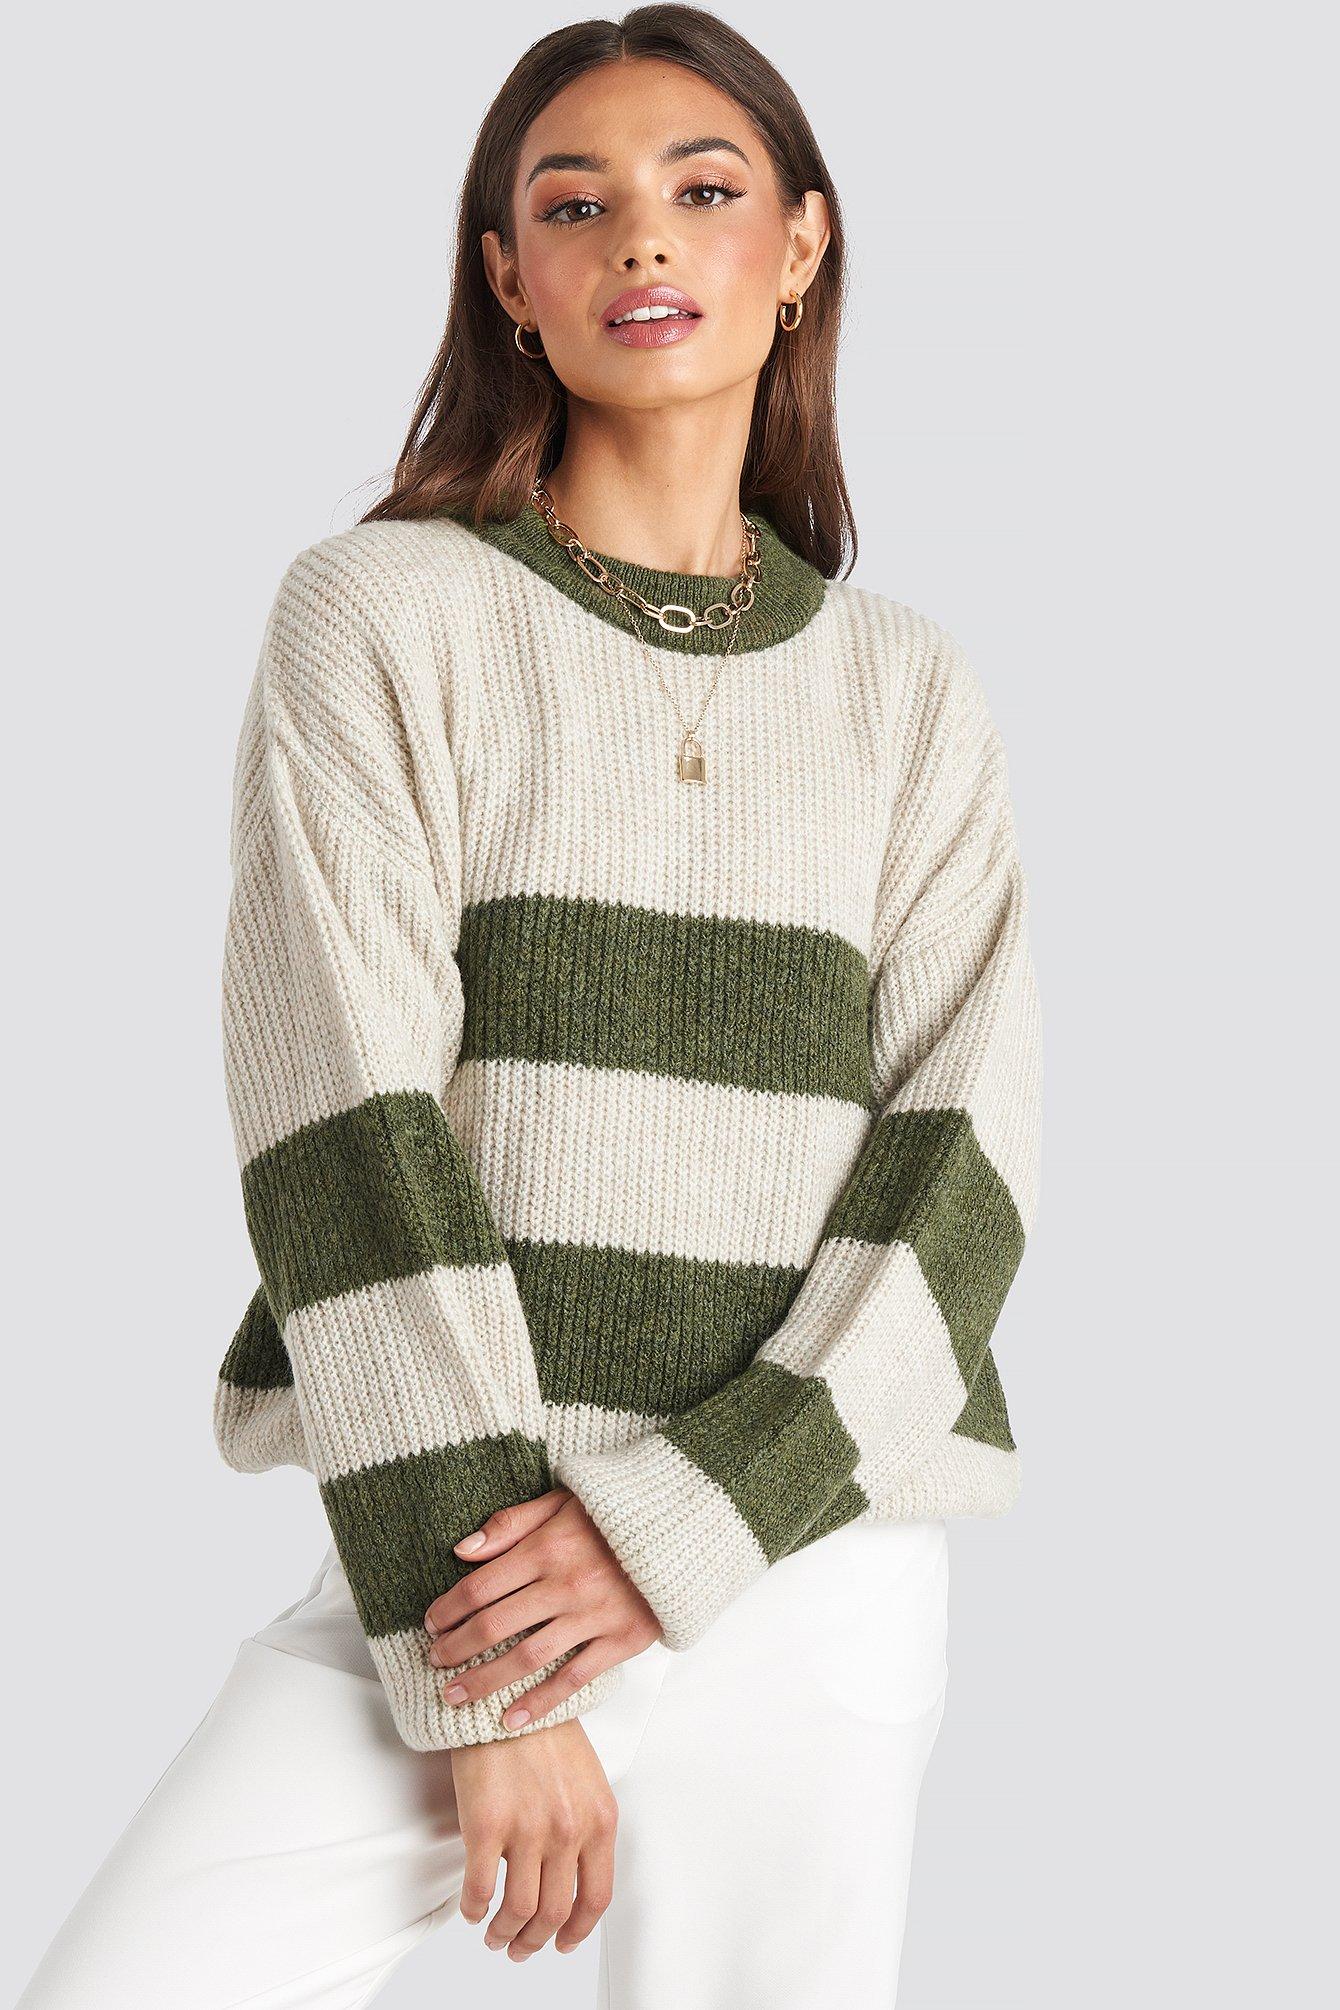 Striped High Neck Knitted Sweater Weiß by Josefinesimonexnakd